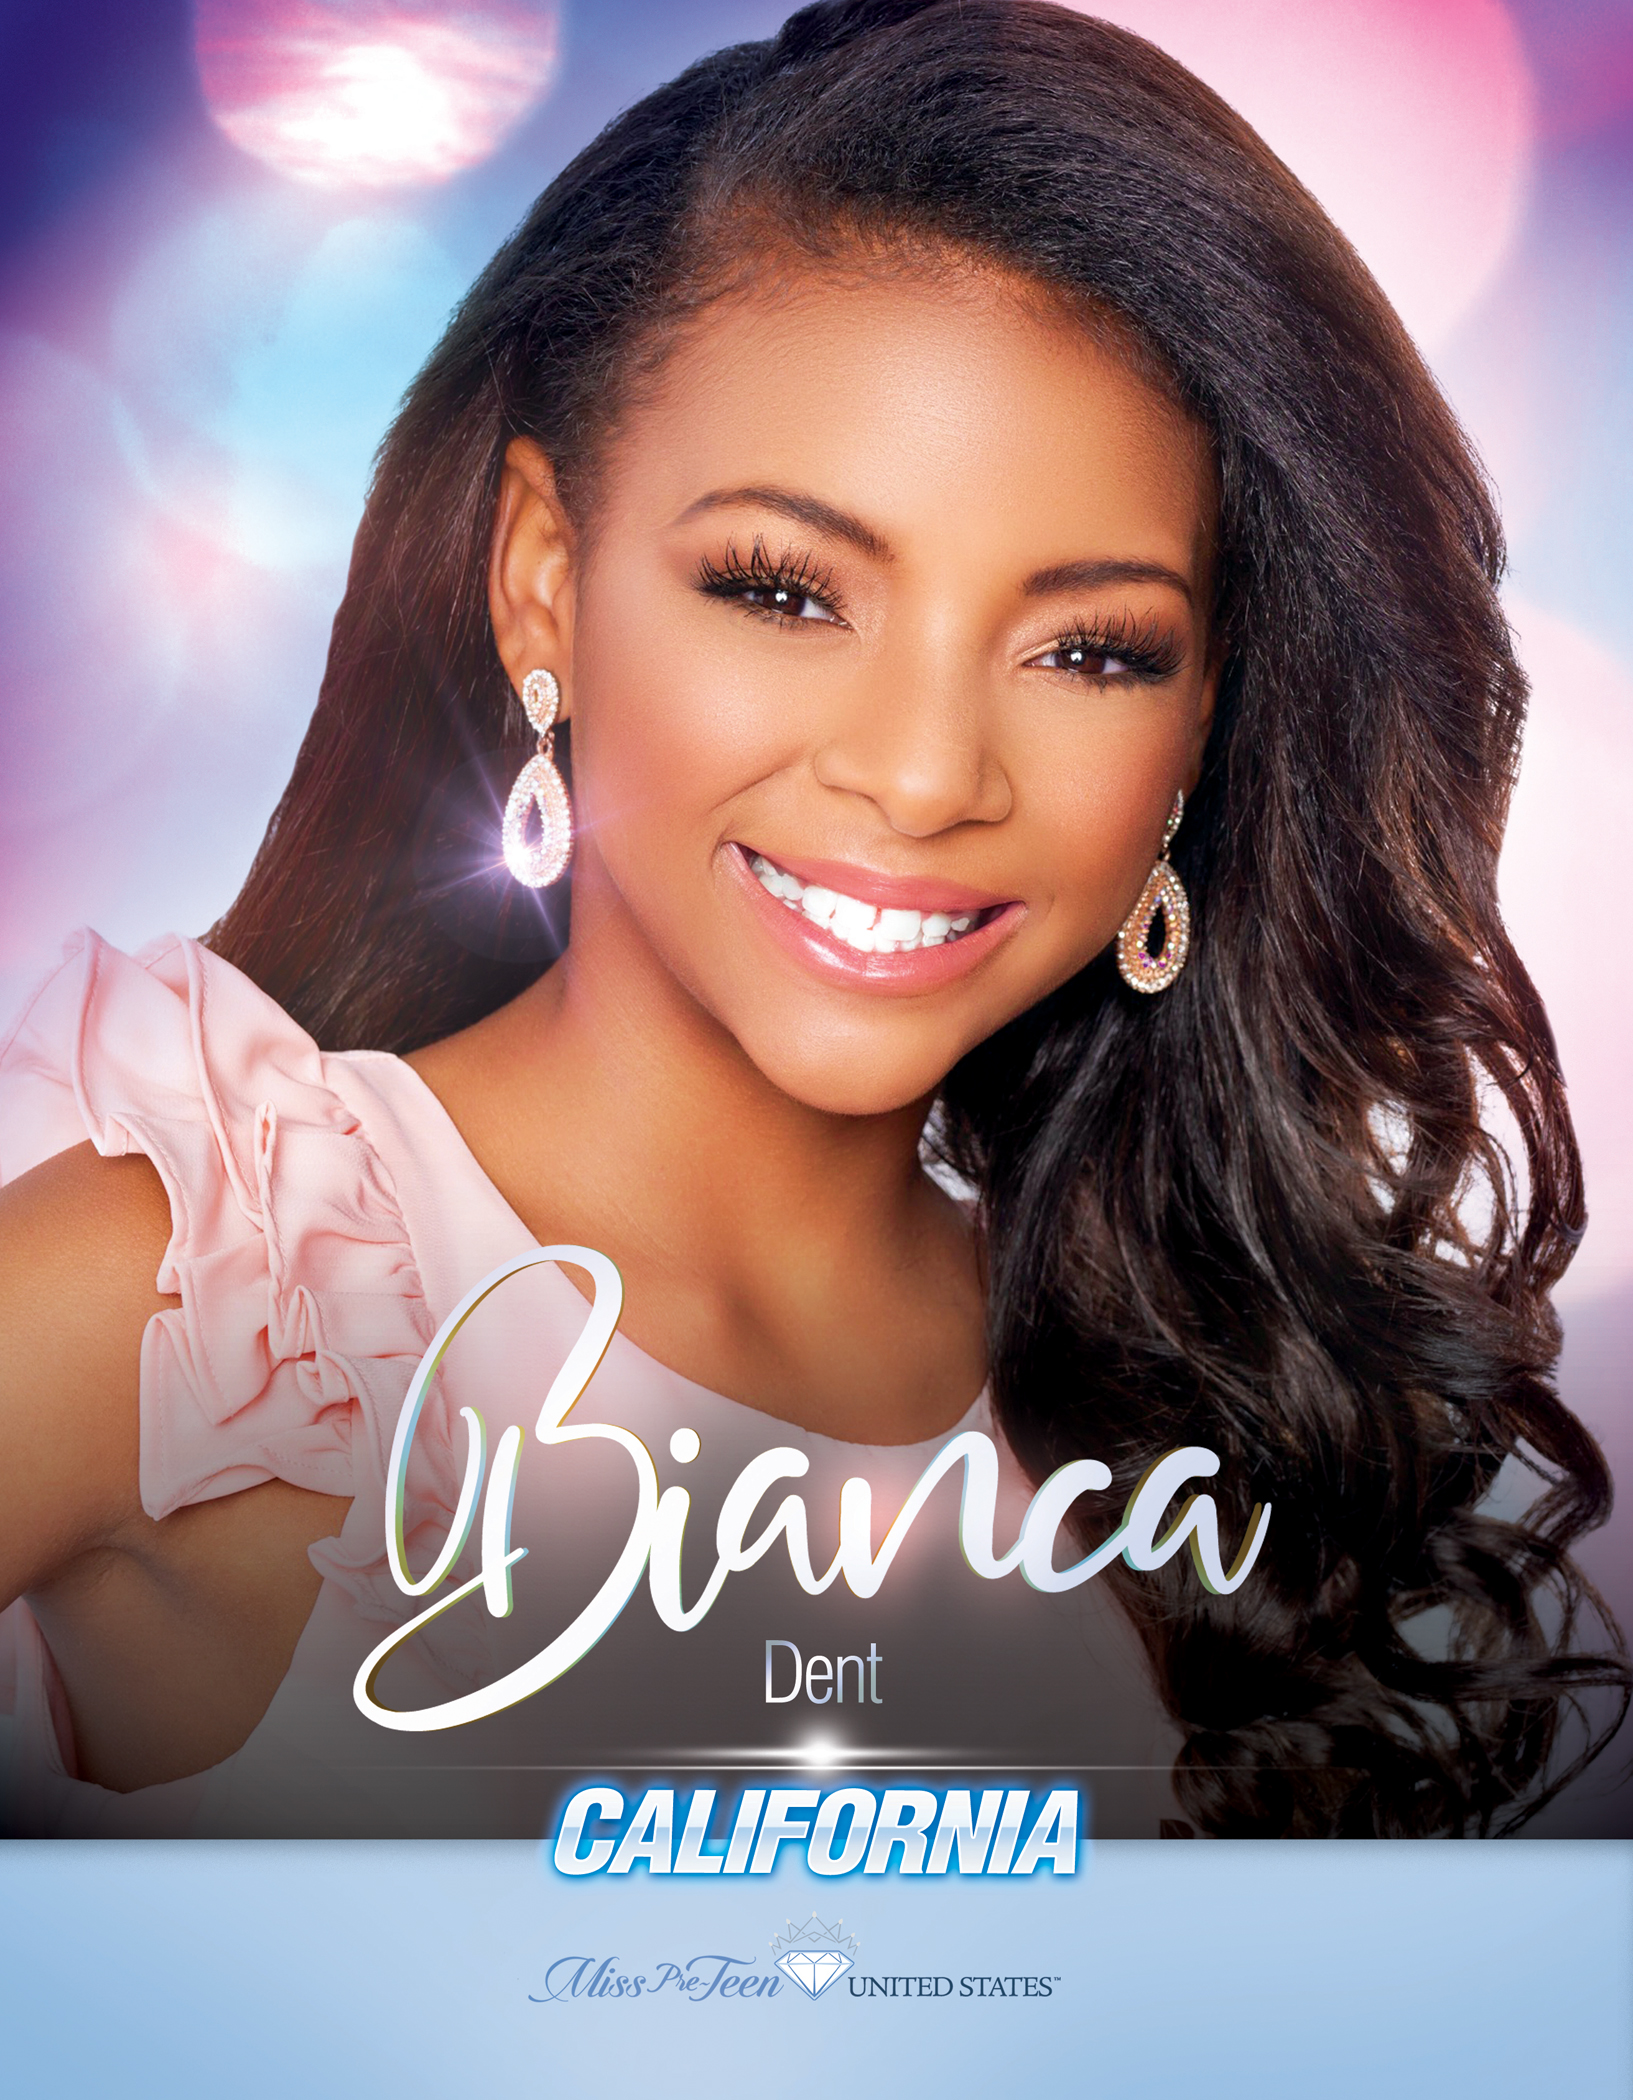 Bianca Dent Miss Pre-Teen California United States - 2019